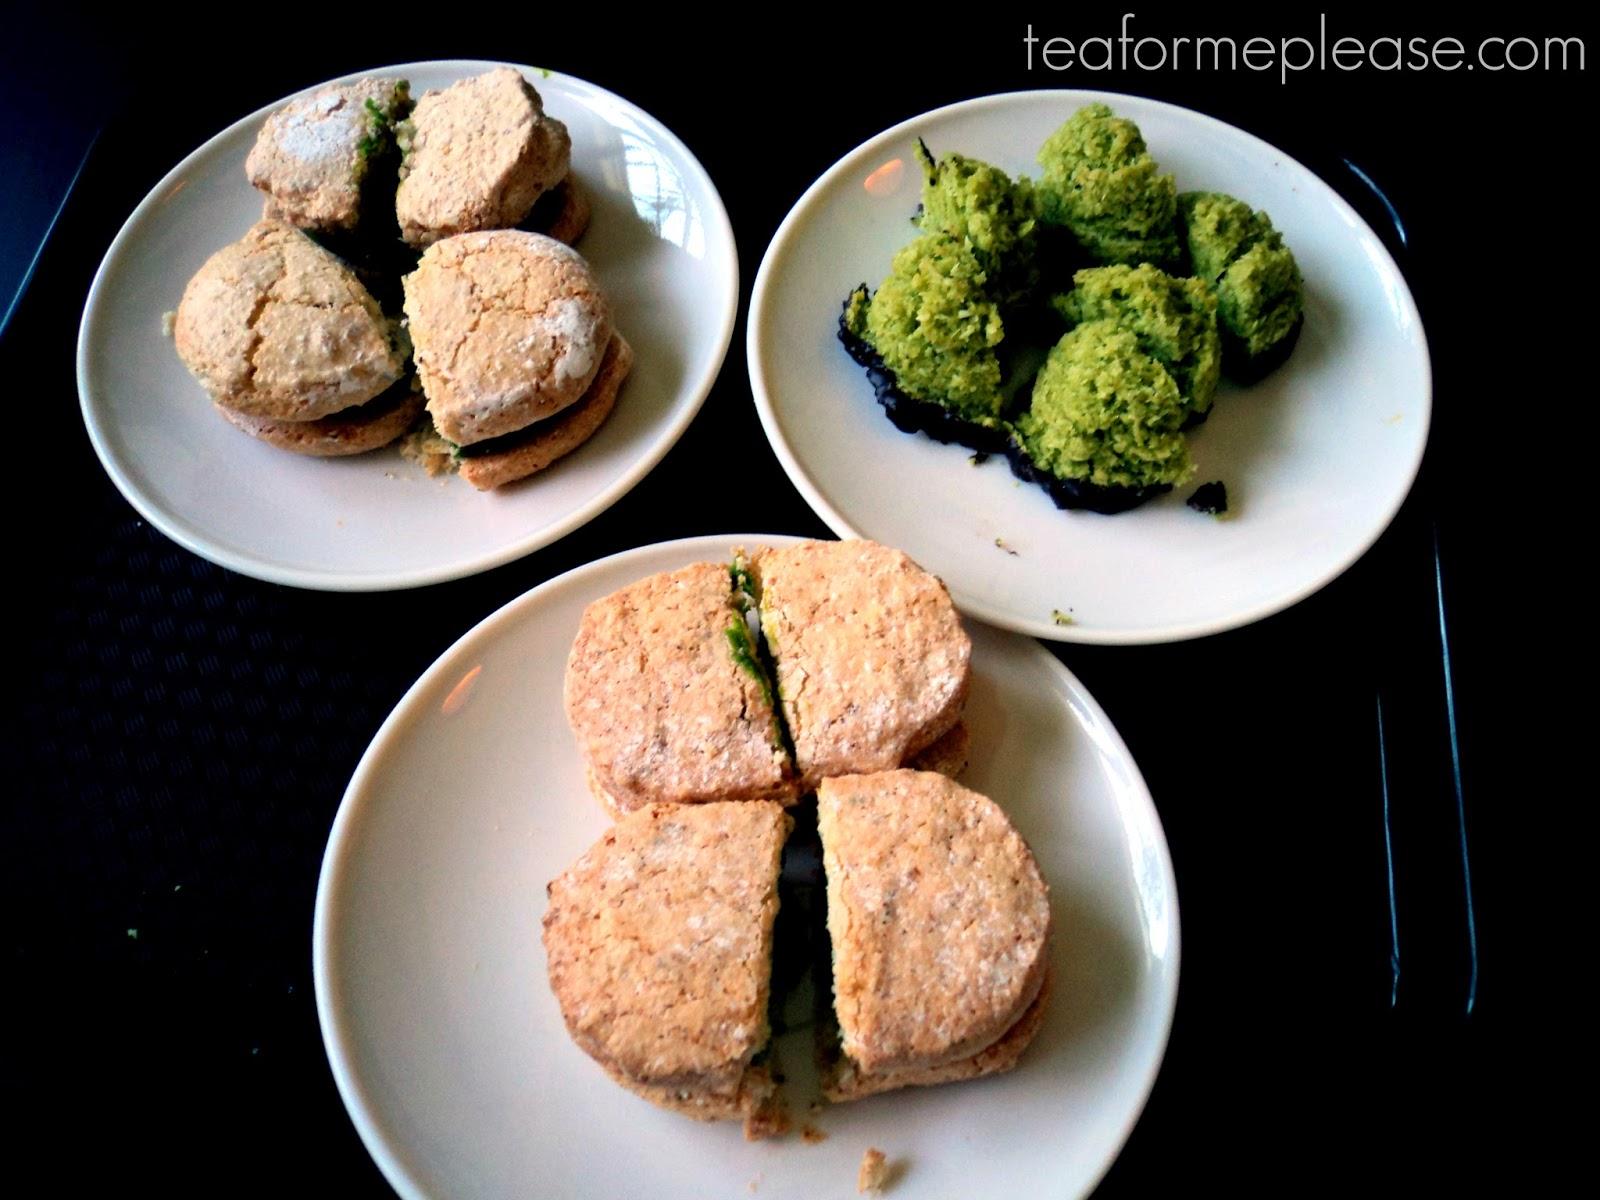 Matcha Baked Goodies